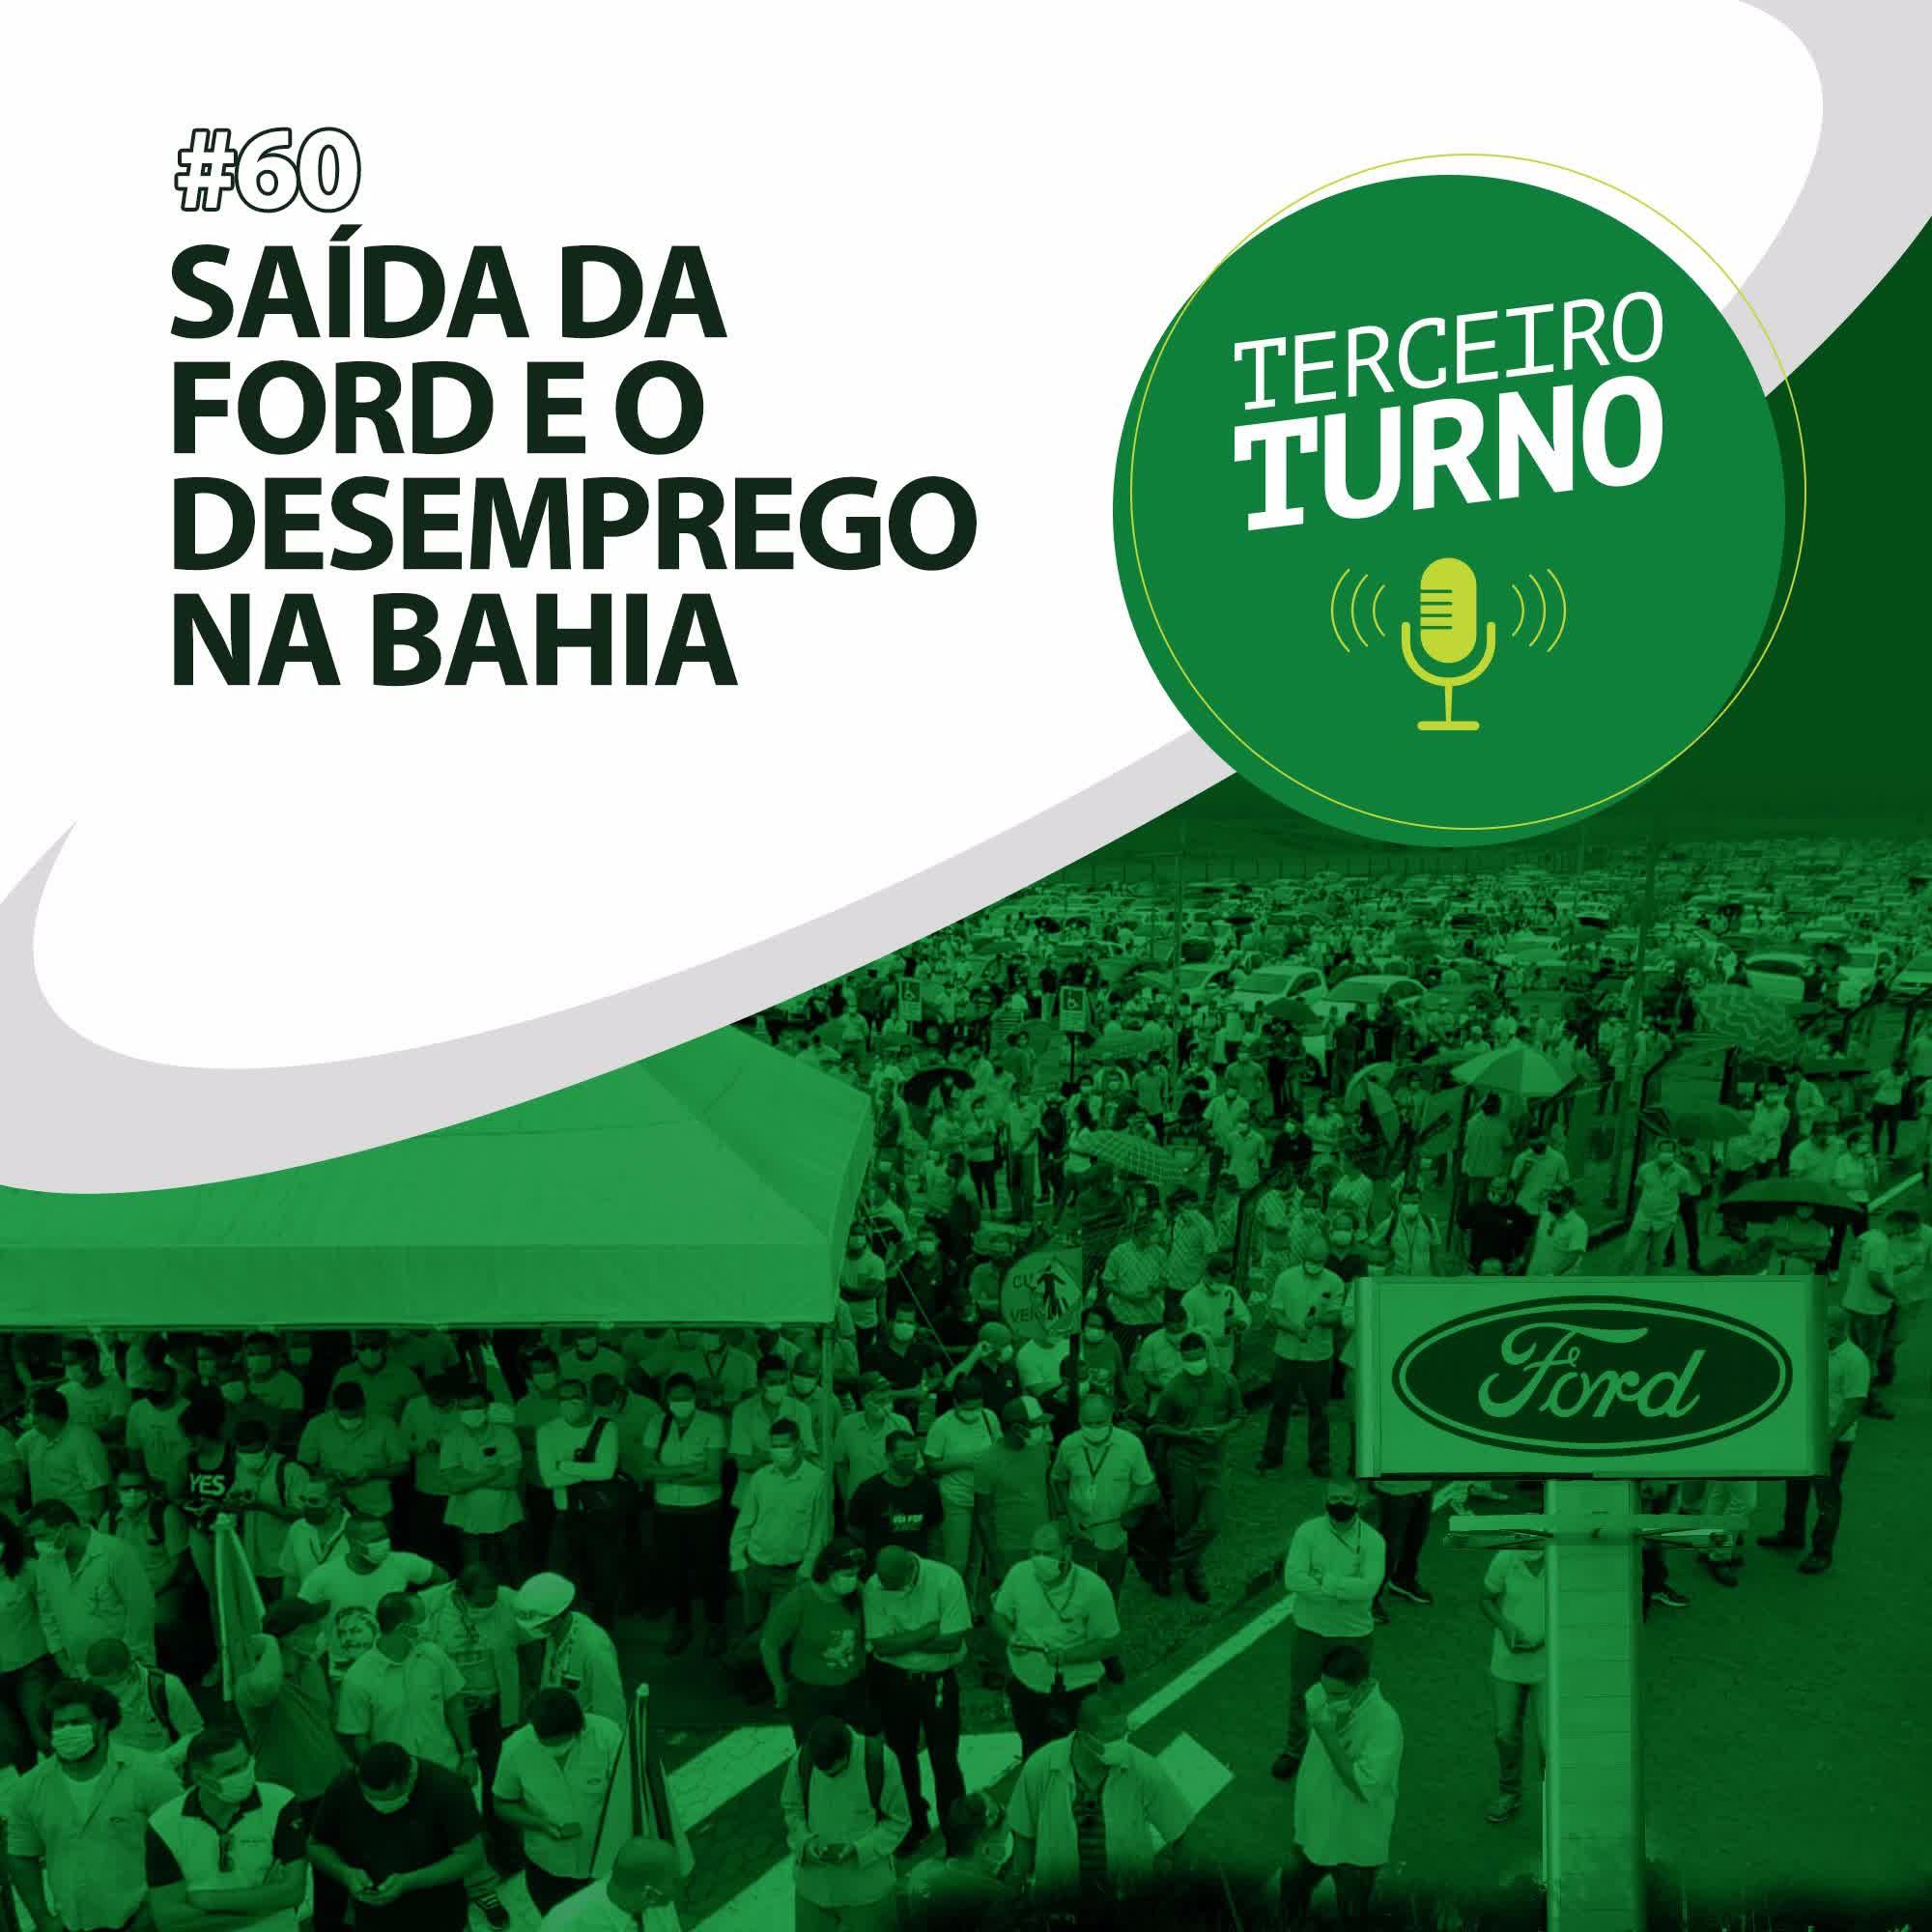 Terceiro Turno #60: Saída da Ford e o desemprego na Bahia